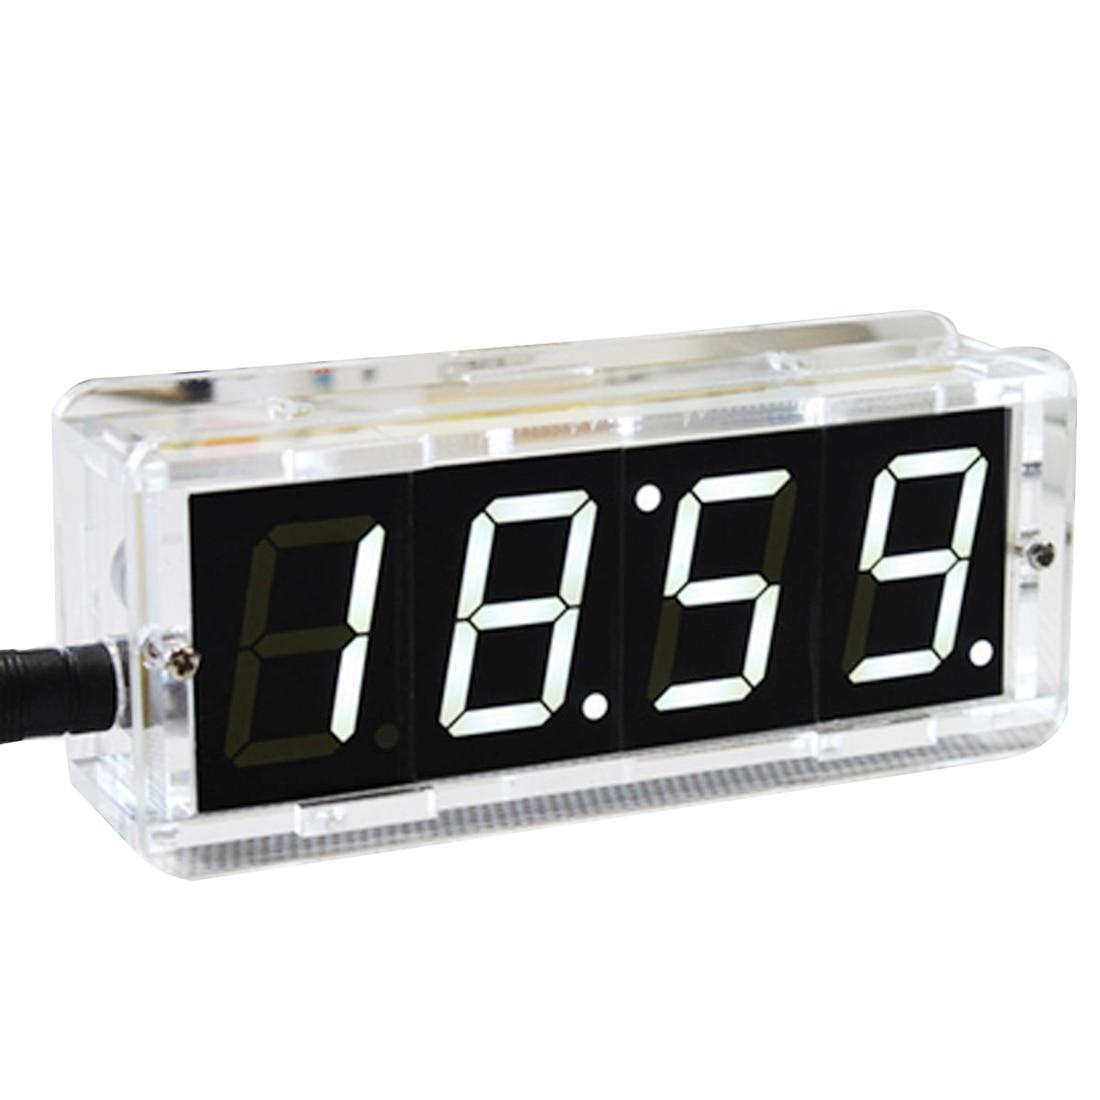 Alarm Clocks Clocks Mrosaa Digital Lcd Display Alarm Clock Kid Table Clock Temperature Humidity Monitor Hygrometer Touch Screen Desktop Alarm Clocks Good Taste